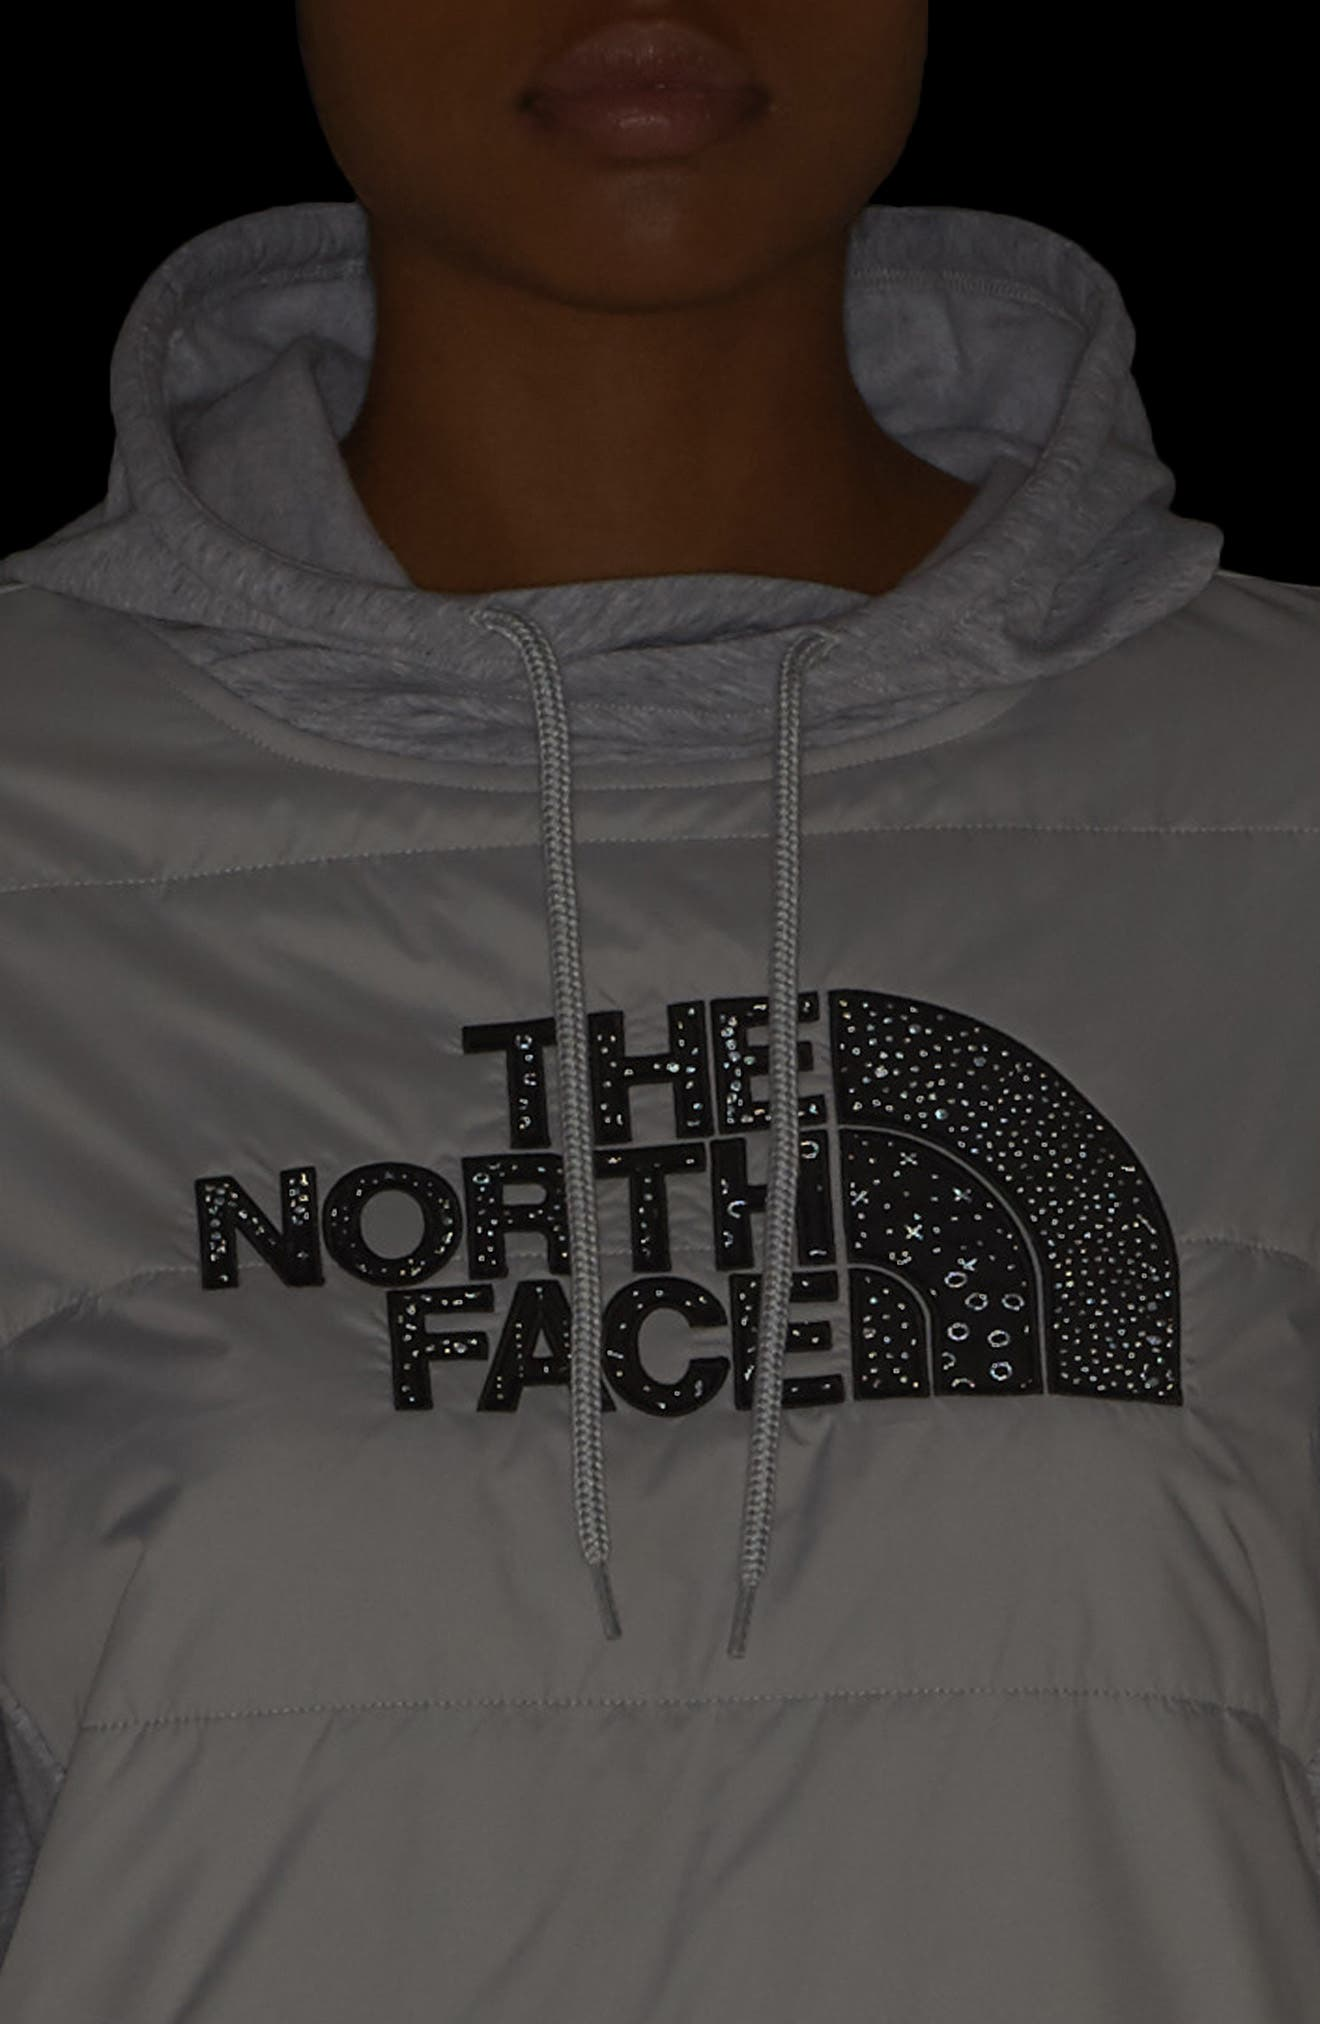 Reflective Logo Hoodie,                             Alternate thumbnail 4, color,                             Tnf Black/ Grey Htr/ Black